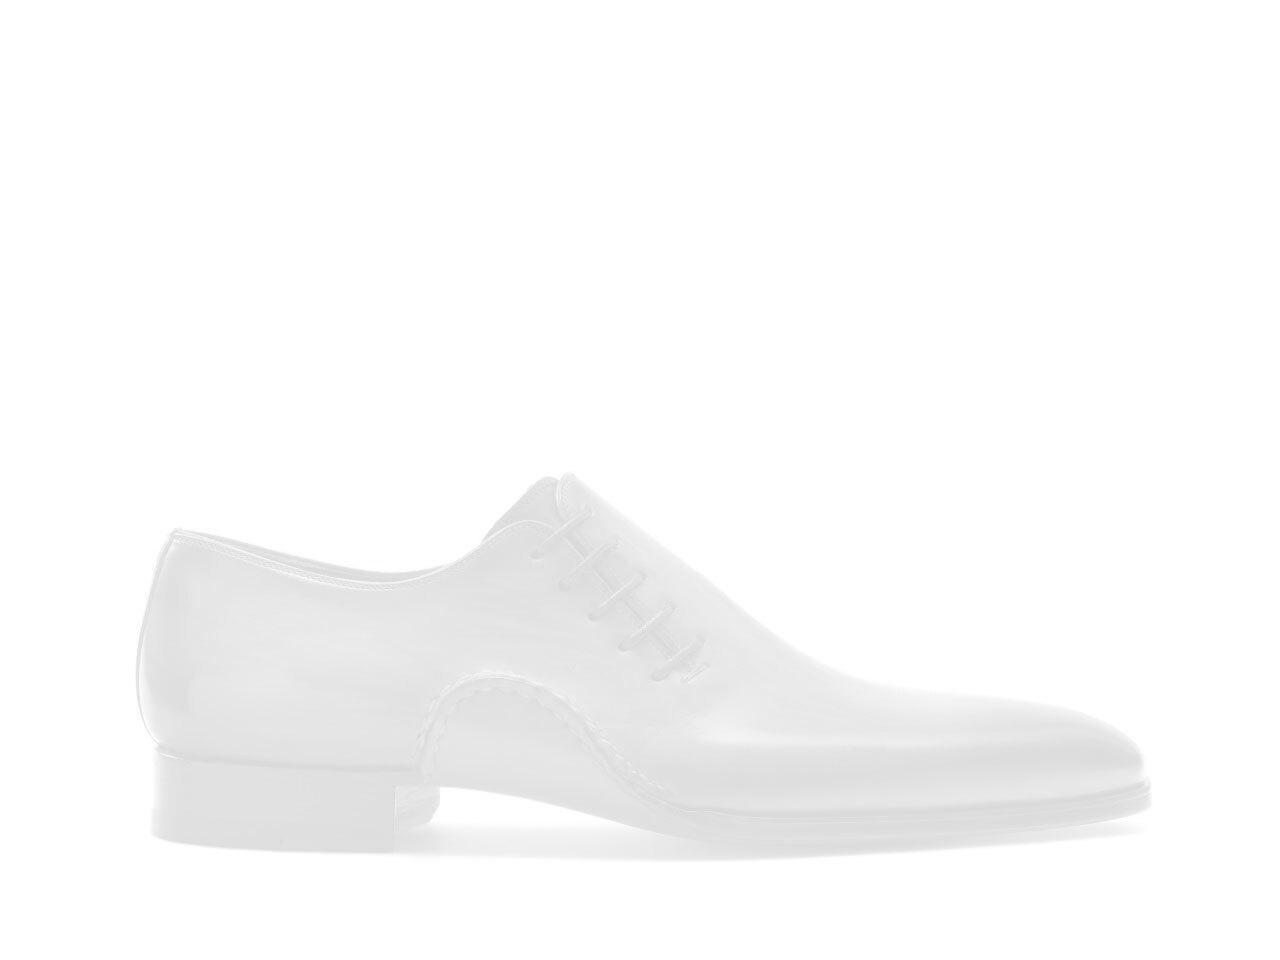 Pair of the Magnanni Segovia Curri Men's Oxford Shoes